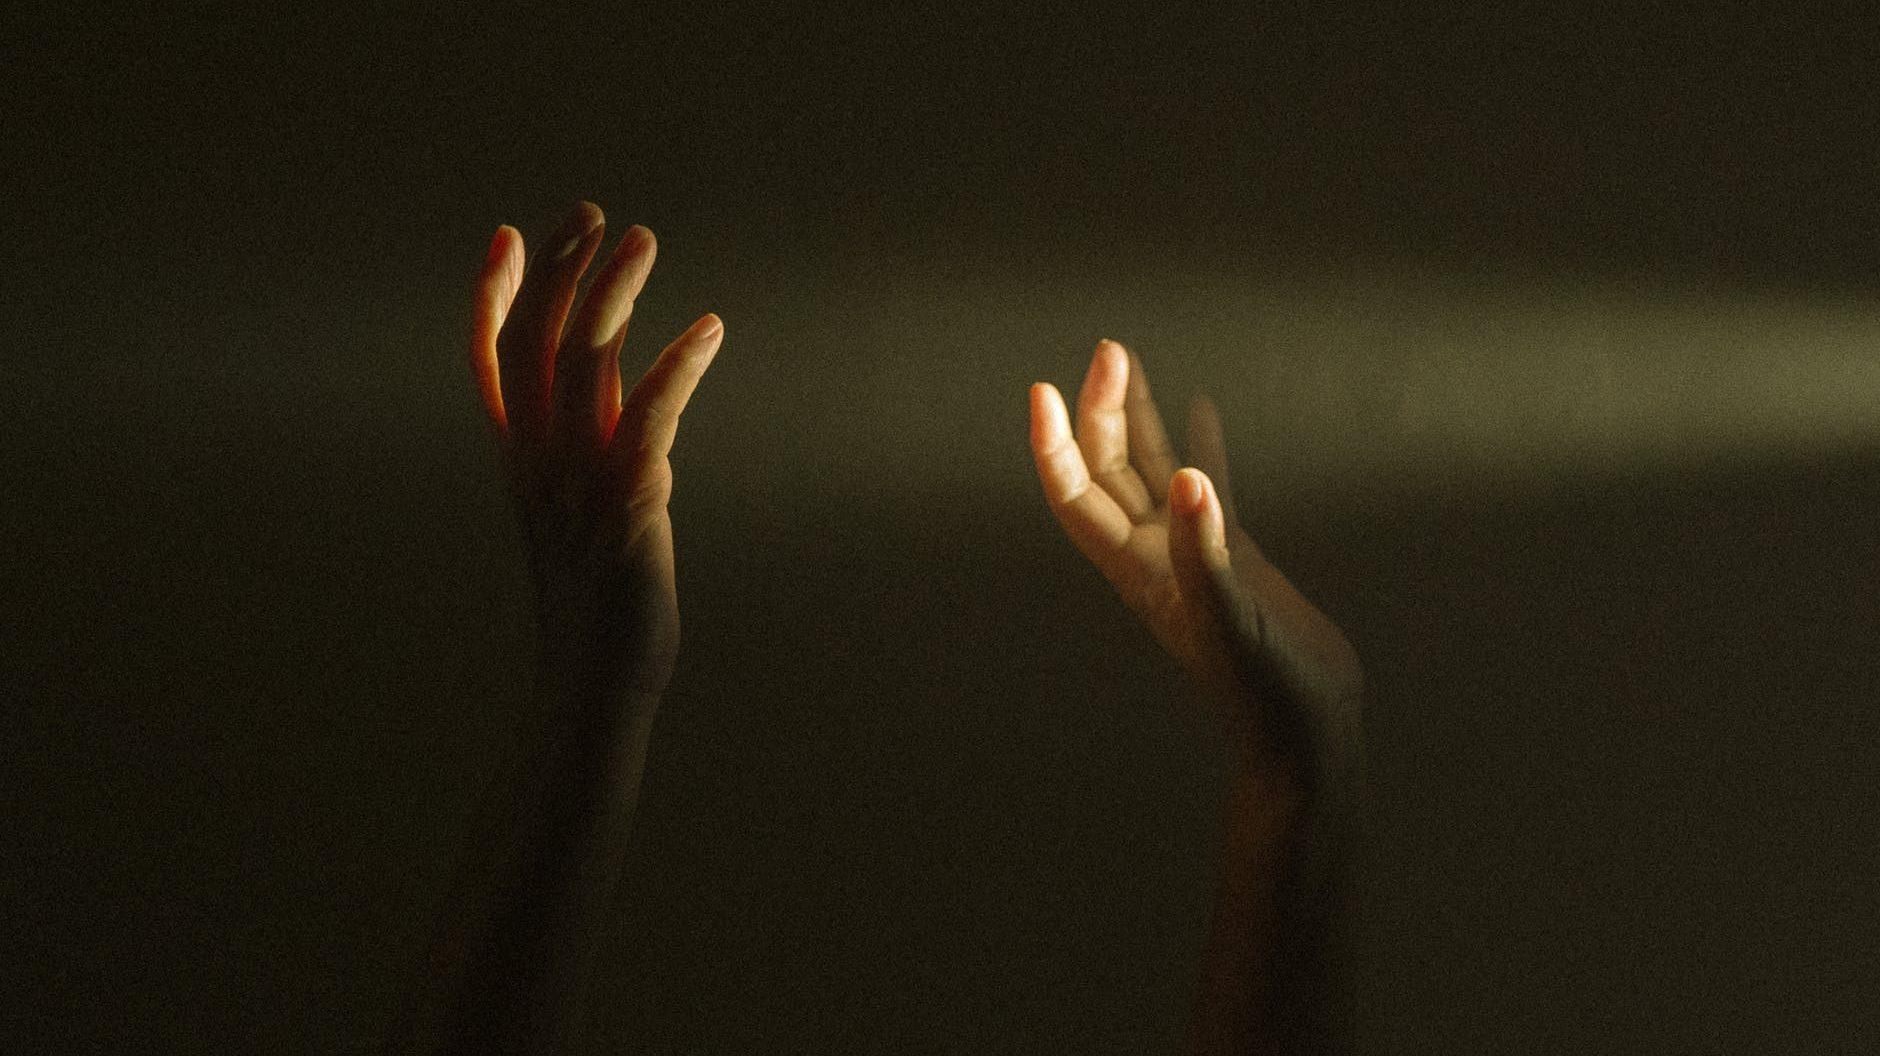 persons raising hands